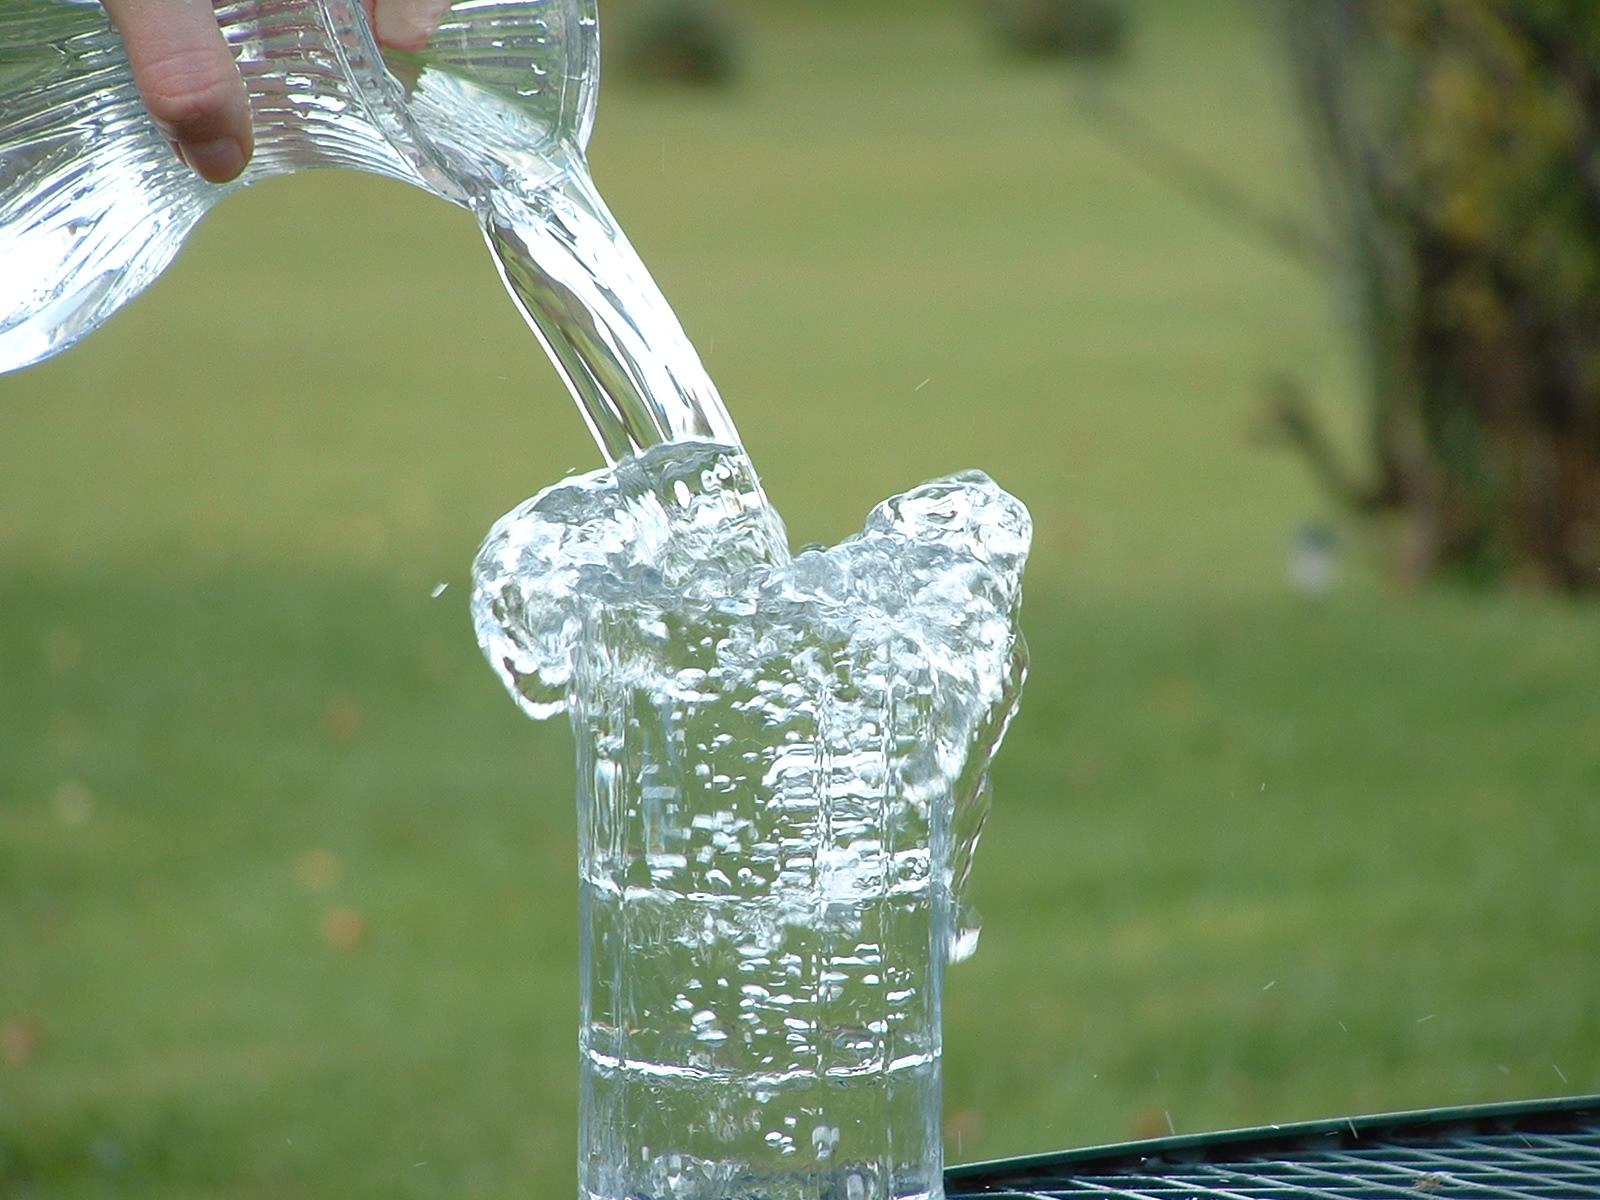 overflowing-glass-3-1259014.jpg